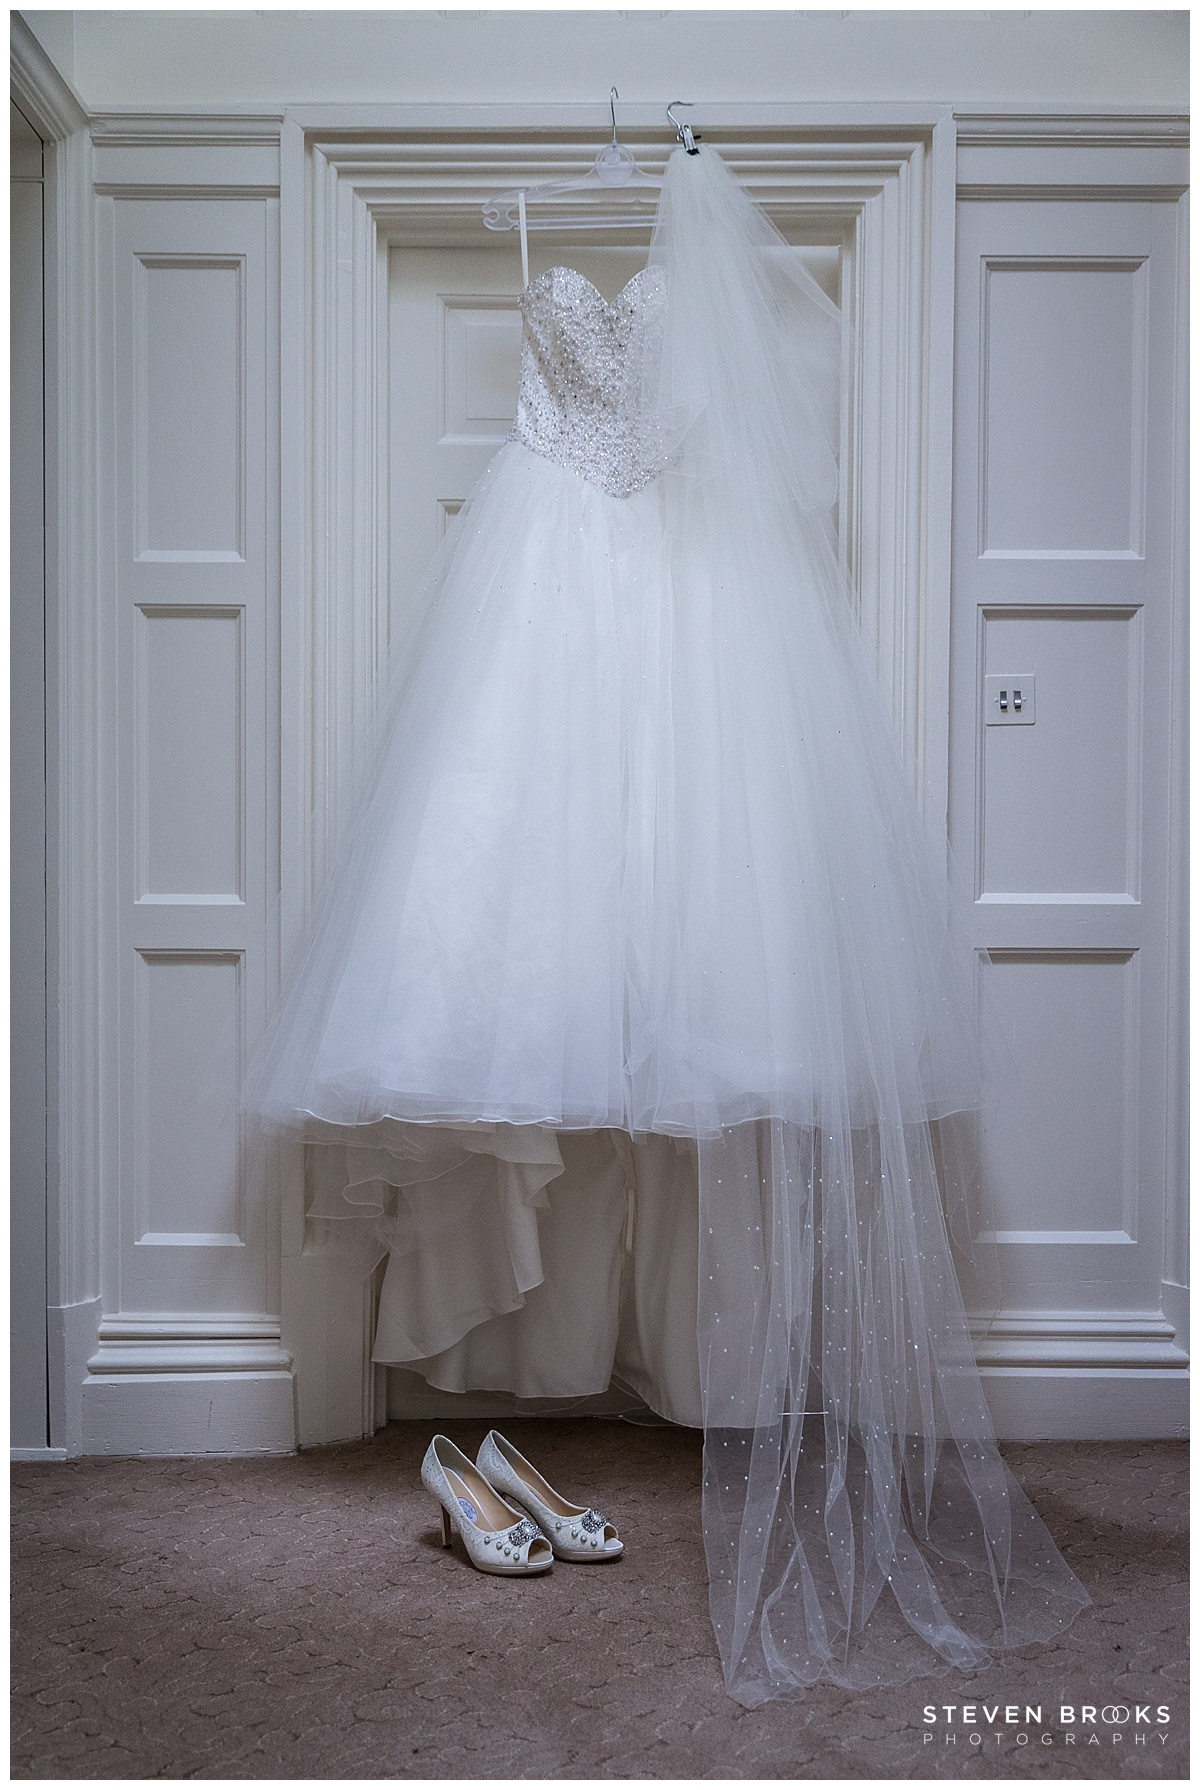 Leeds Castle wedding photographer steven brooks photographs wedding dress in the castle